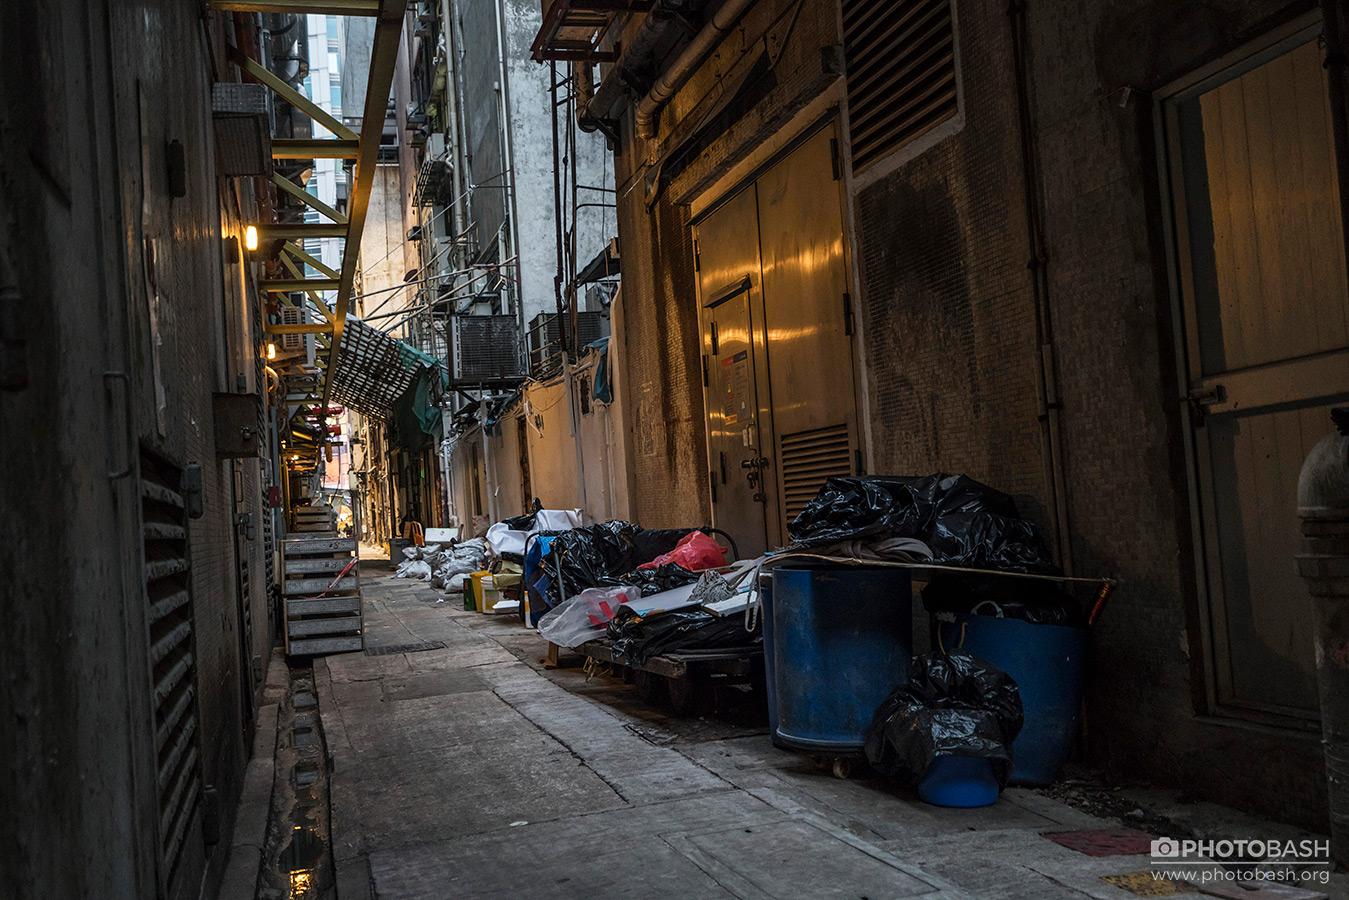 Dirty-Alley-Hong-Kong-Dark-Street.jpg